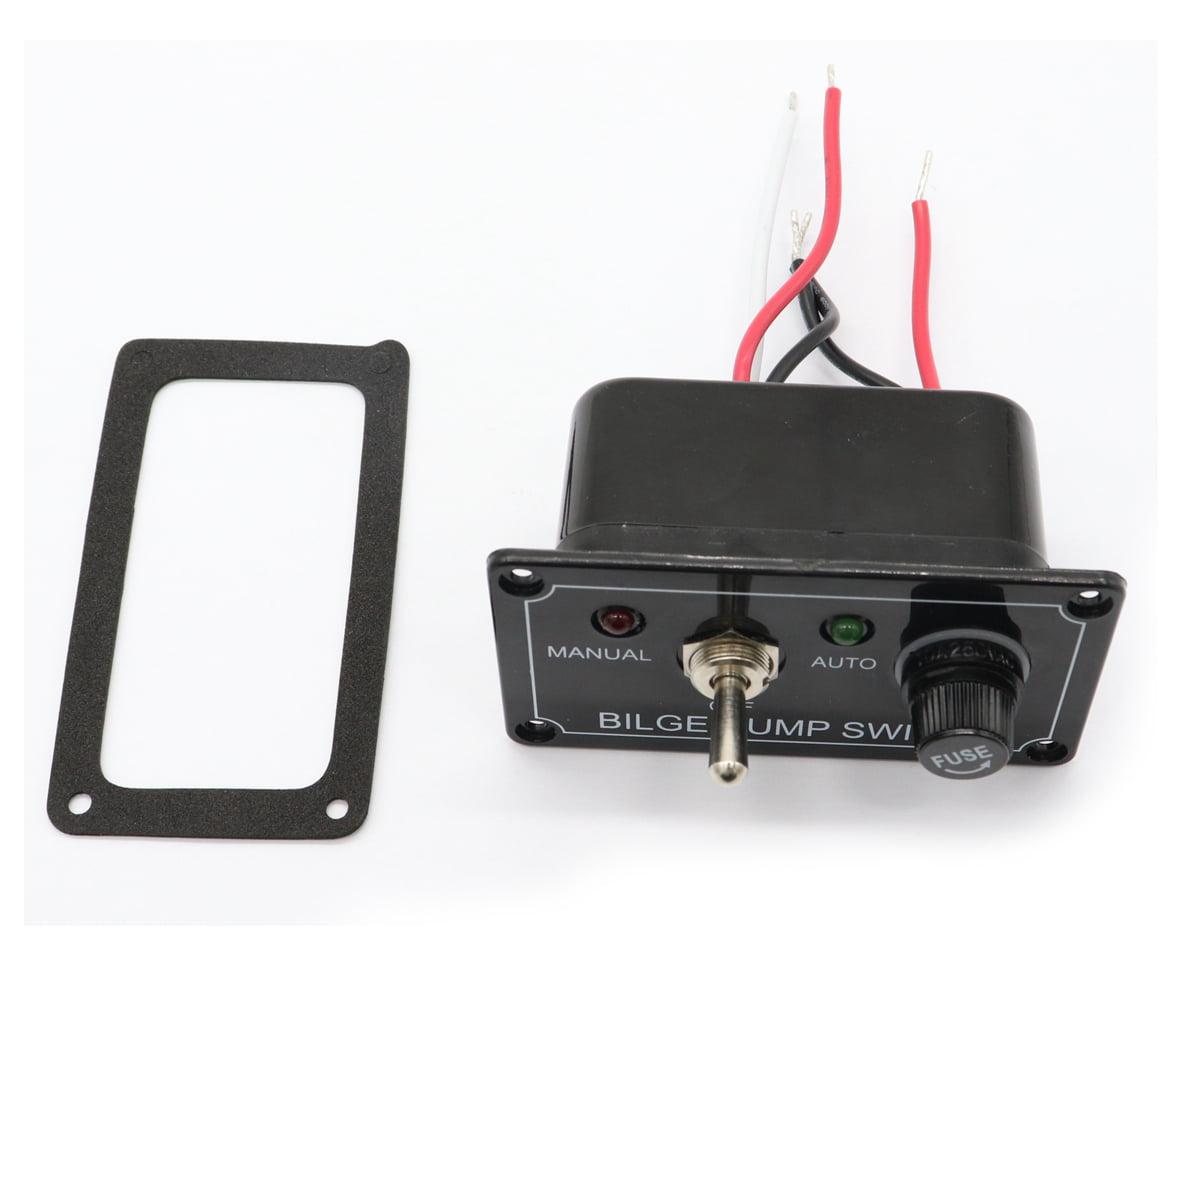 3 Way DC 12V Fused Marine Bilge Pump Switch Control Panel W// LED Indicator